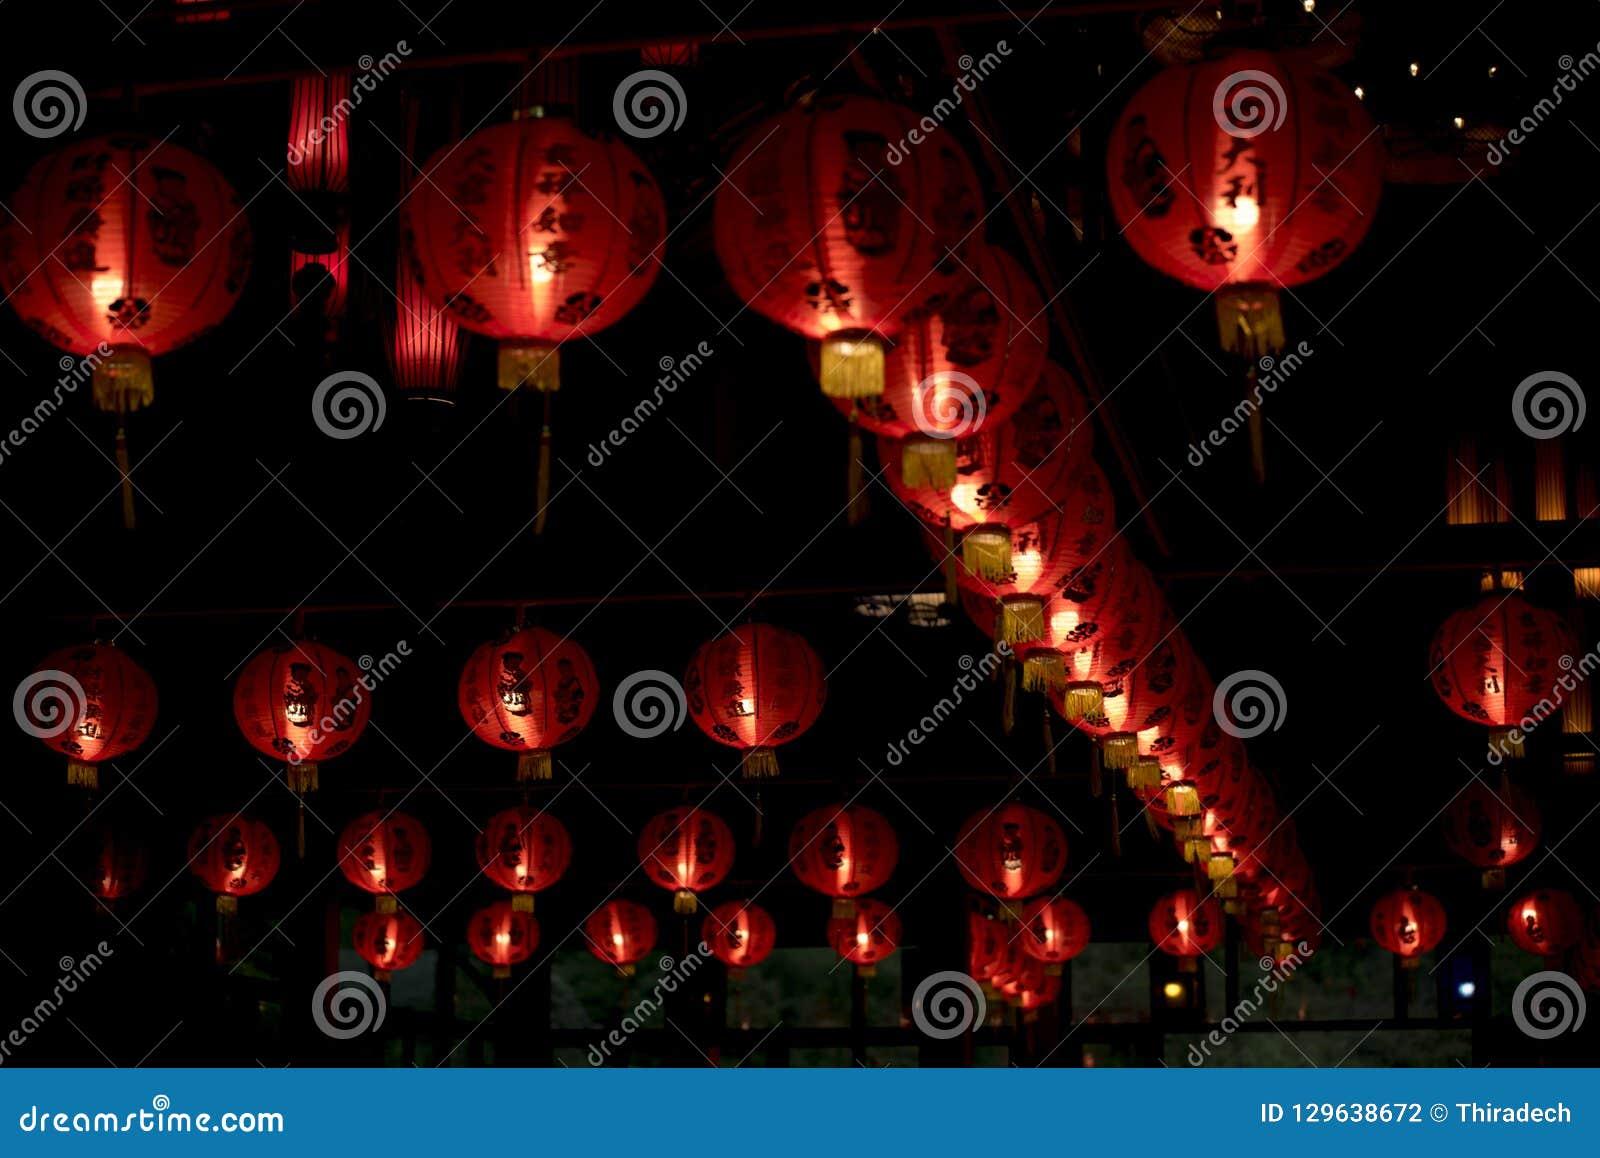 Red Lanterns Oriental Charm Stock Photo Image Of Hanging